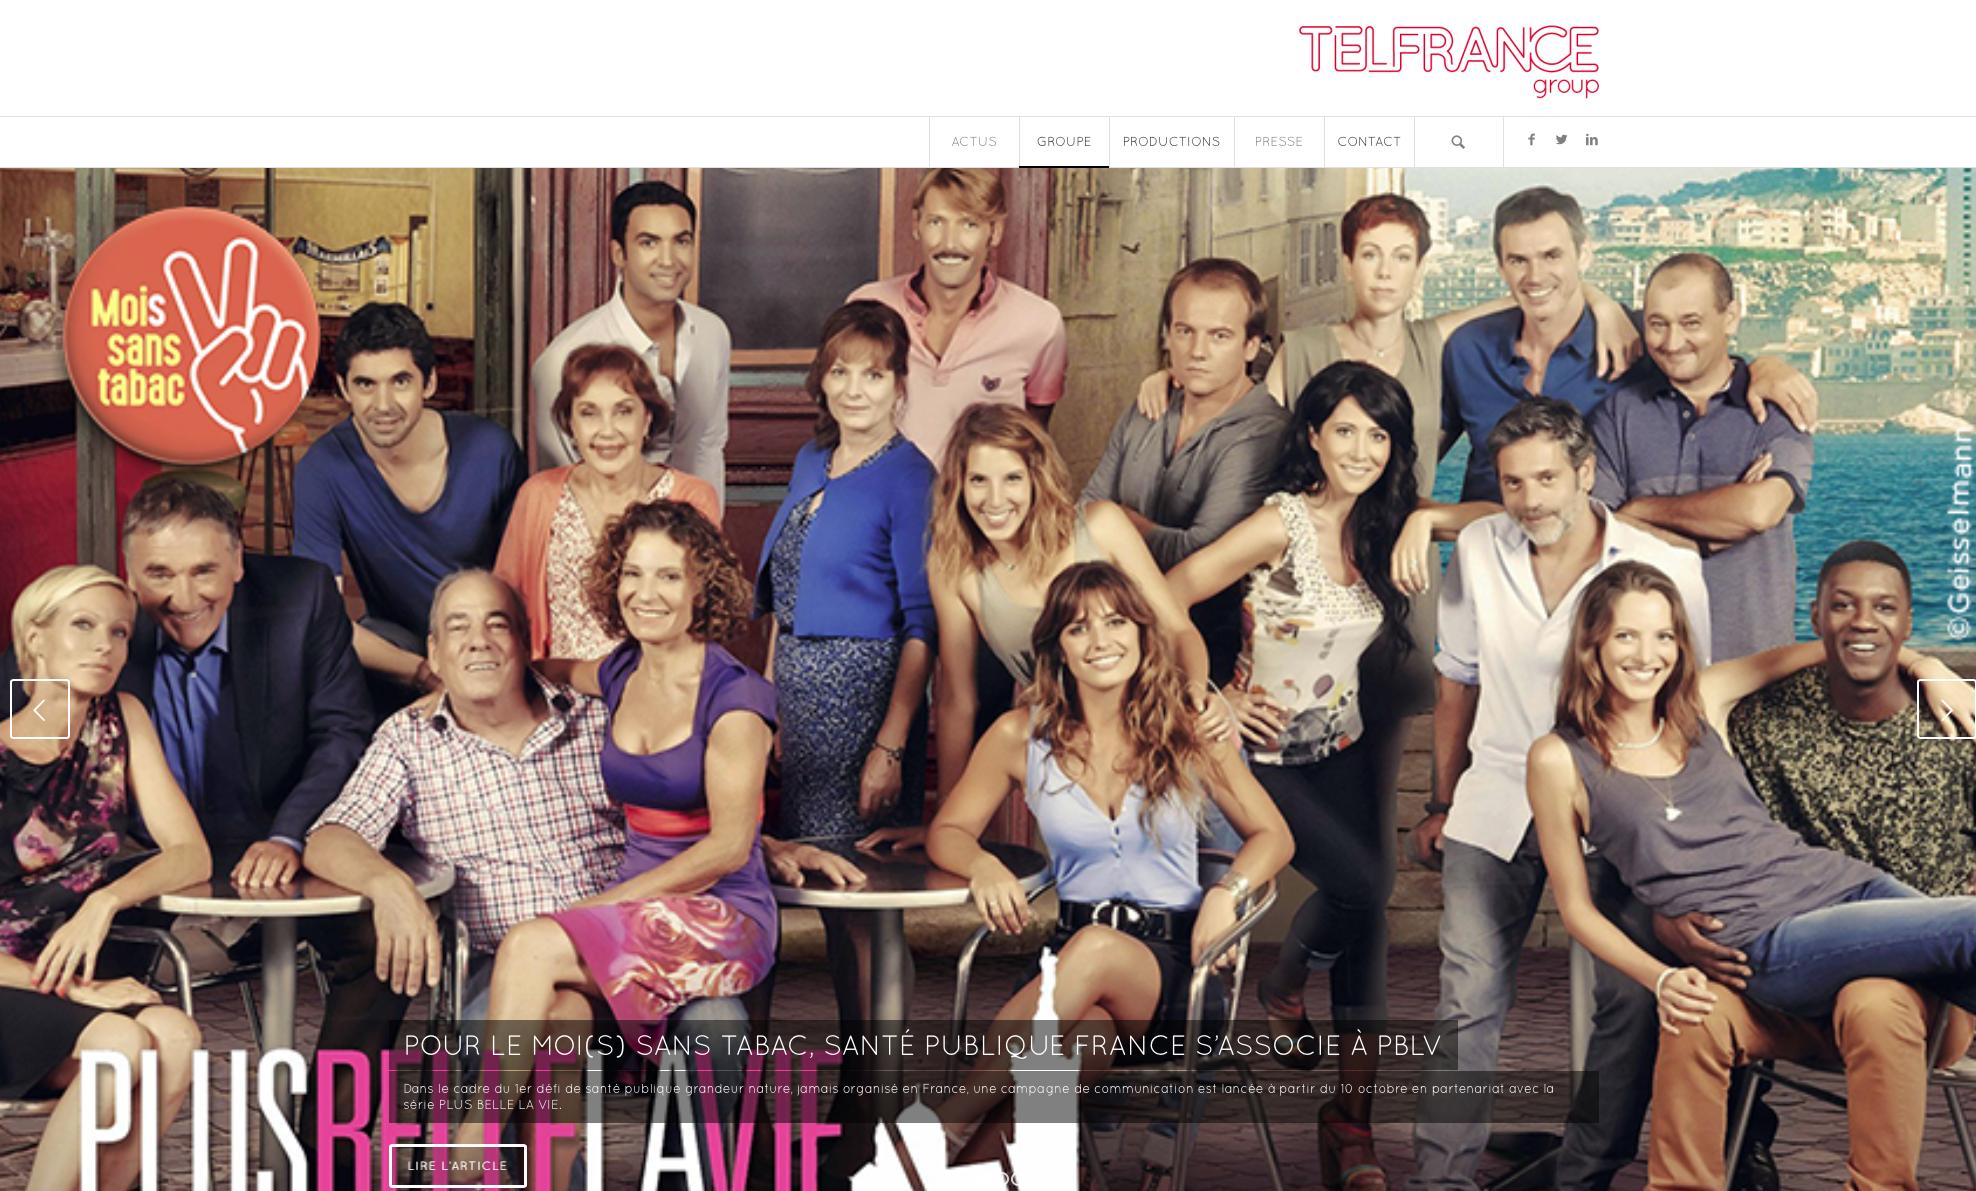 Traduction français anglais pour Telfrance